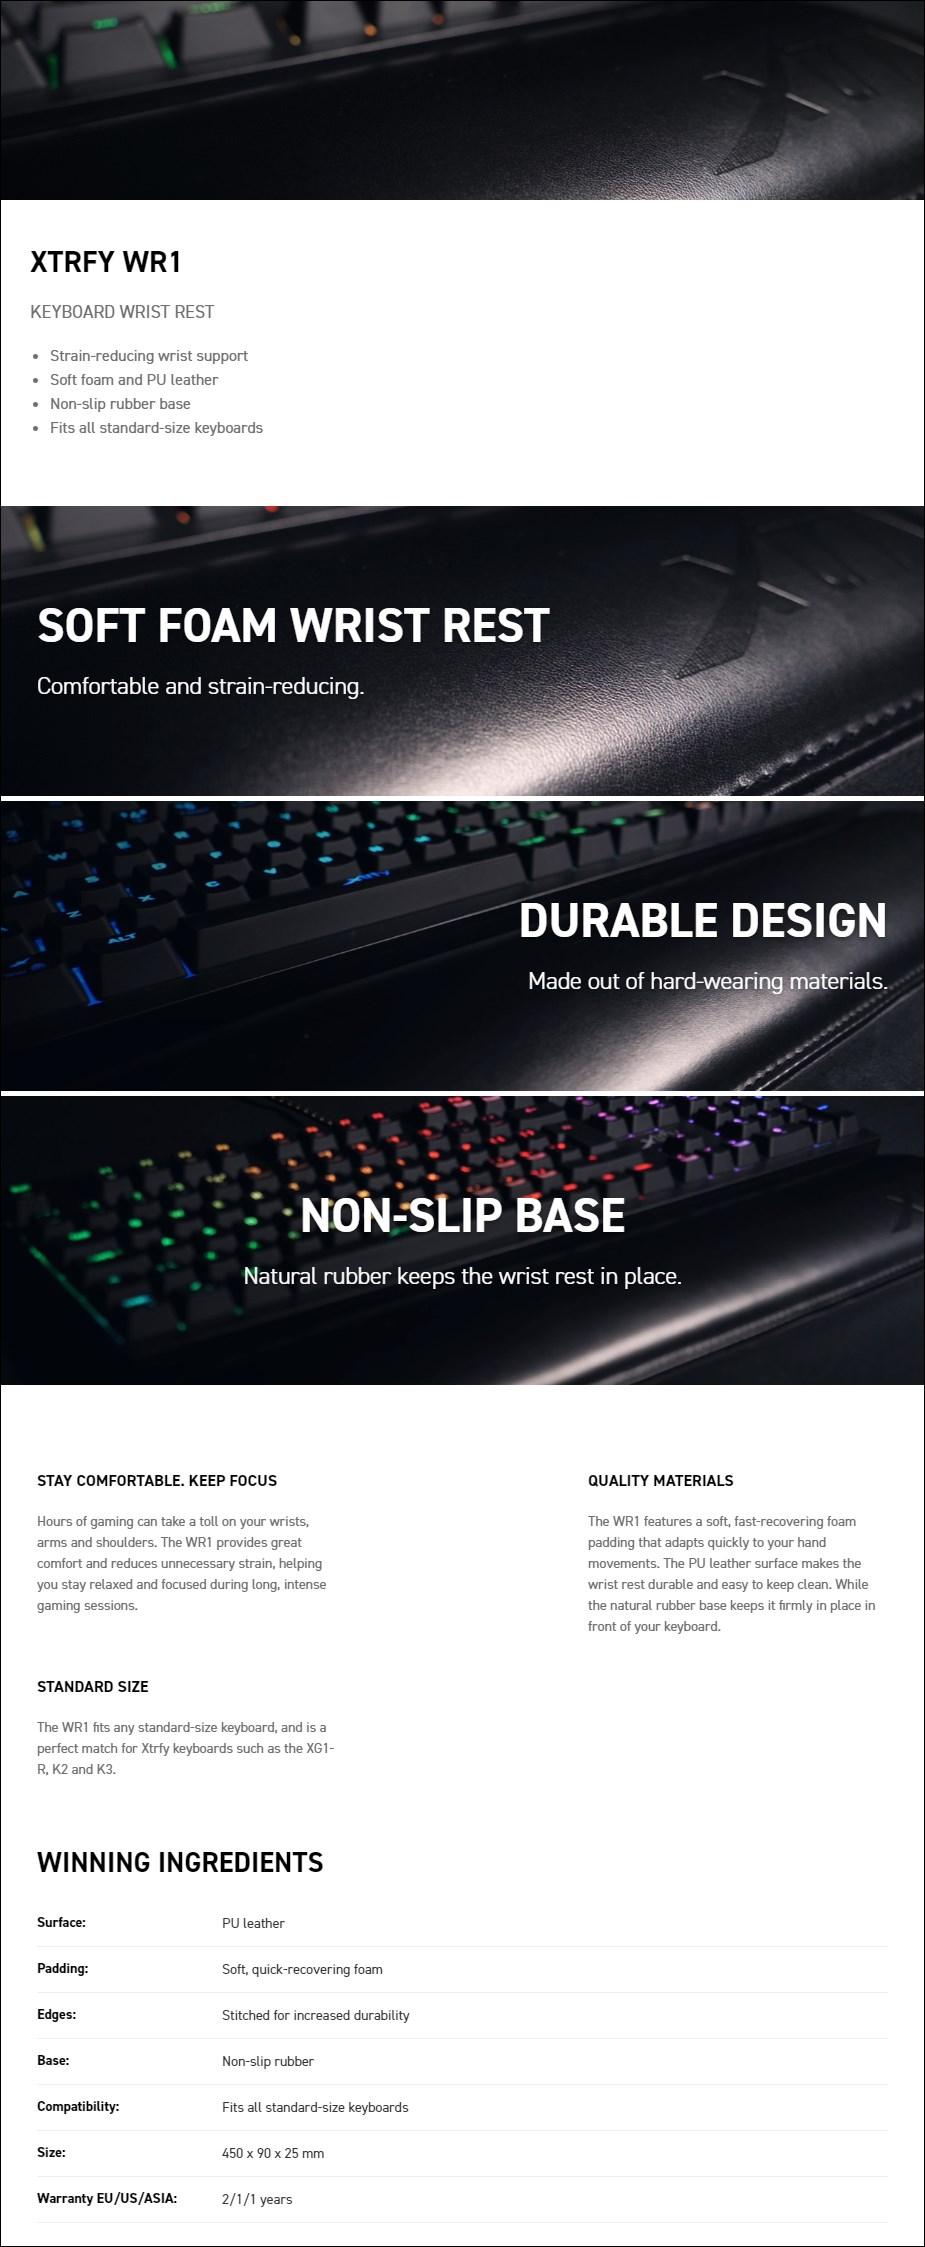 Xtrfy WR1 Leather Keyboard Wrist Rest - Overview 1